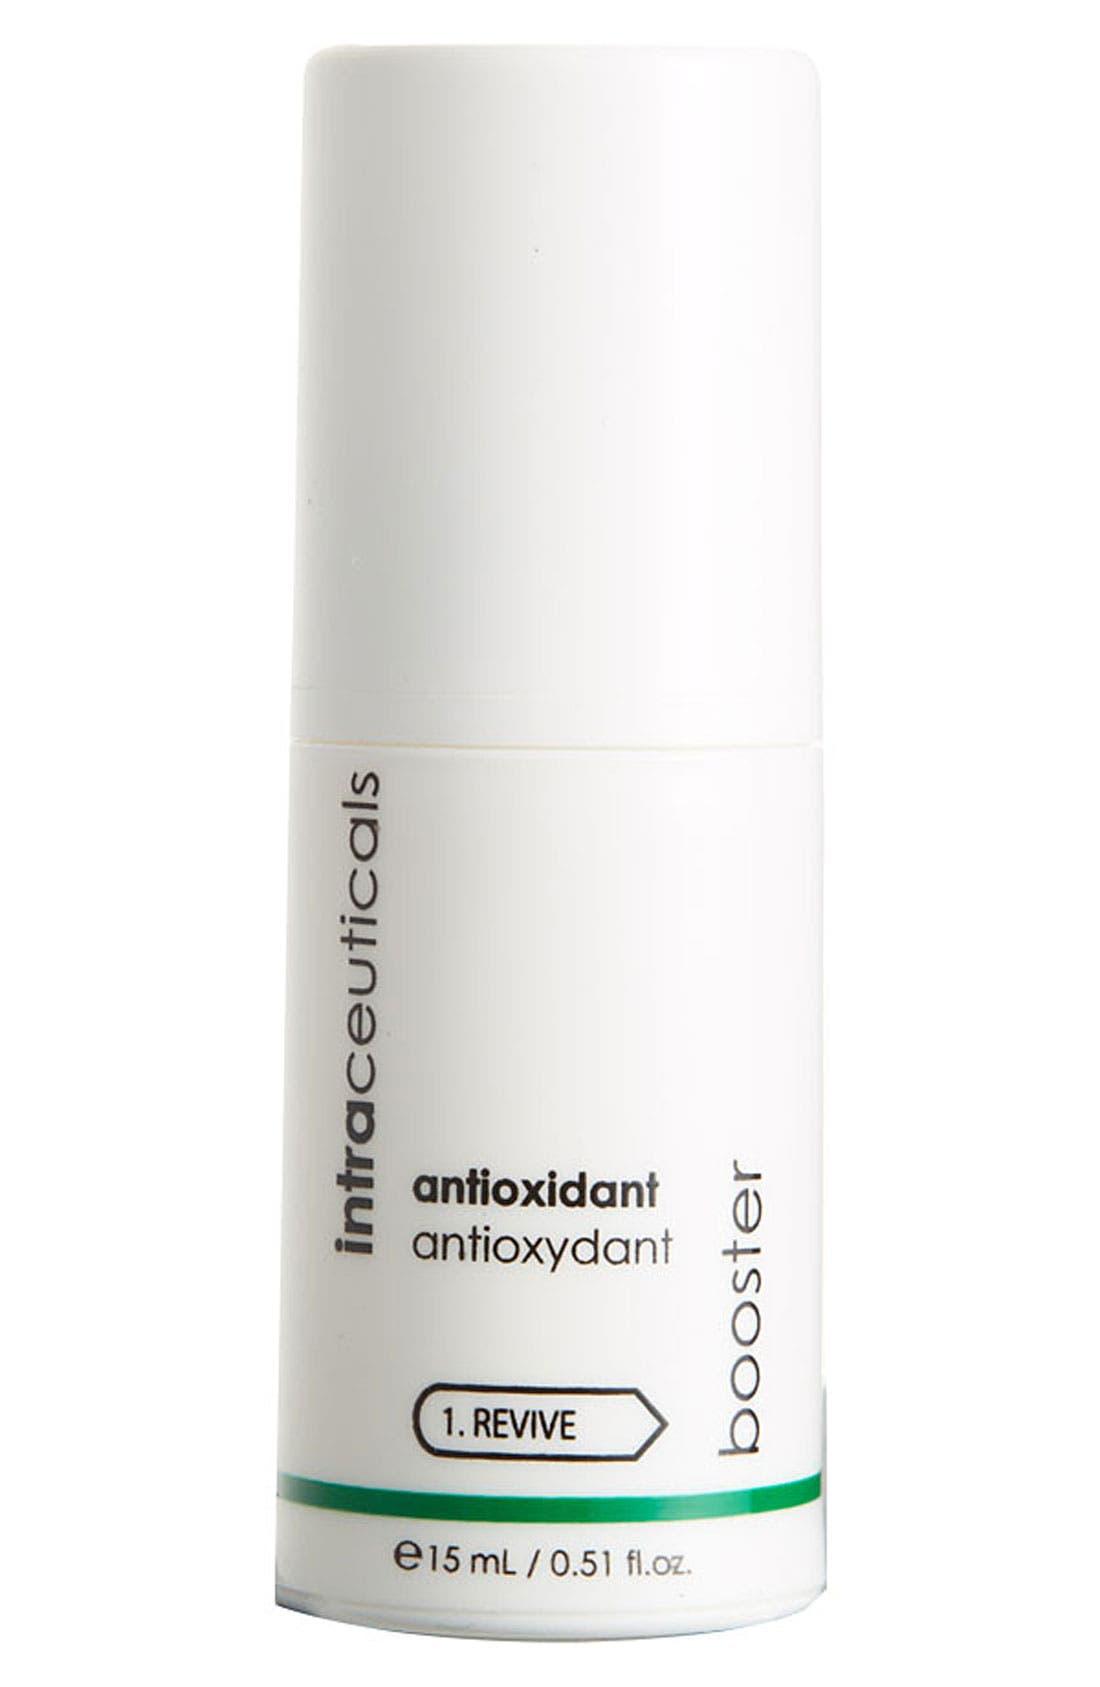 'Booster' Antioxidant Serum,                             Main thumbnail 1, color,                             000